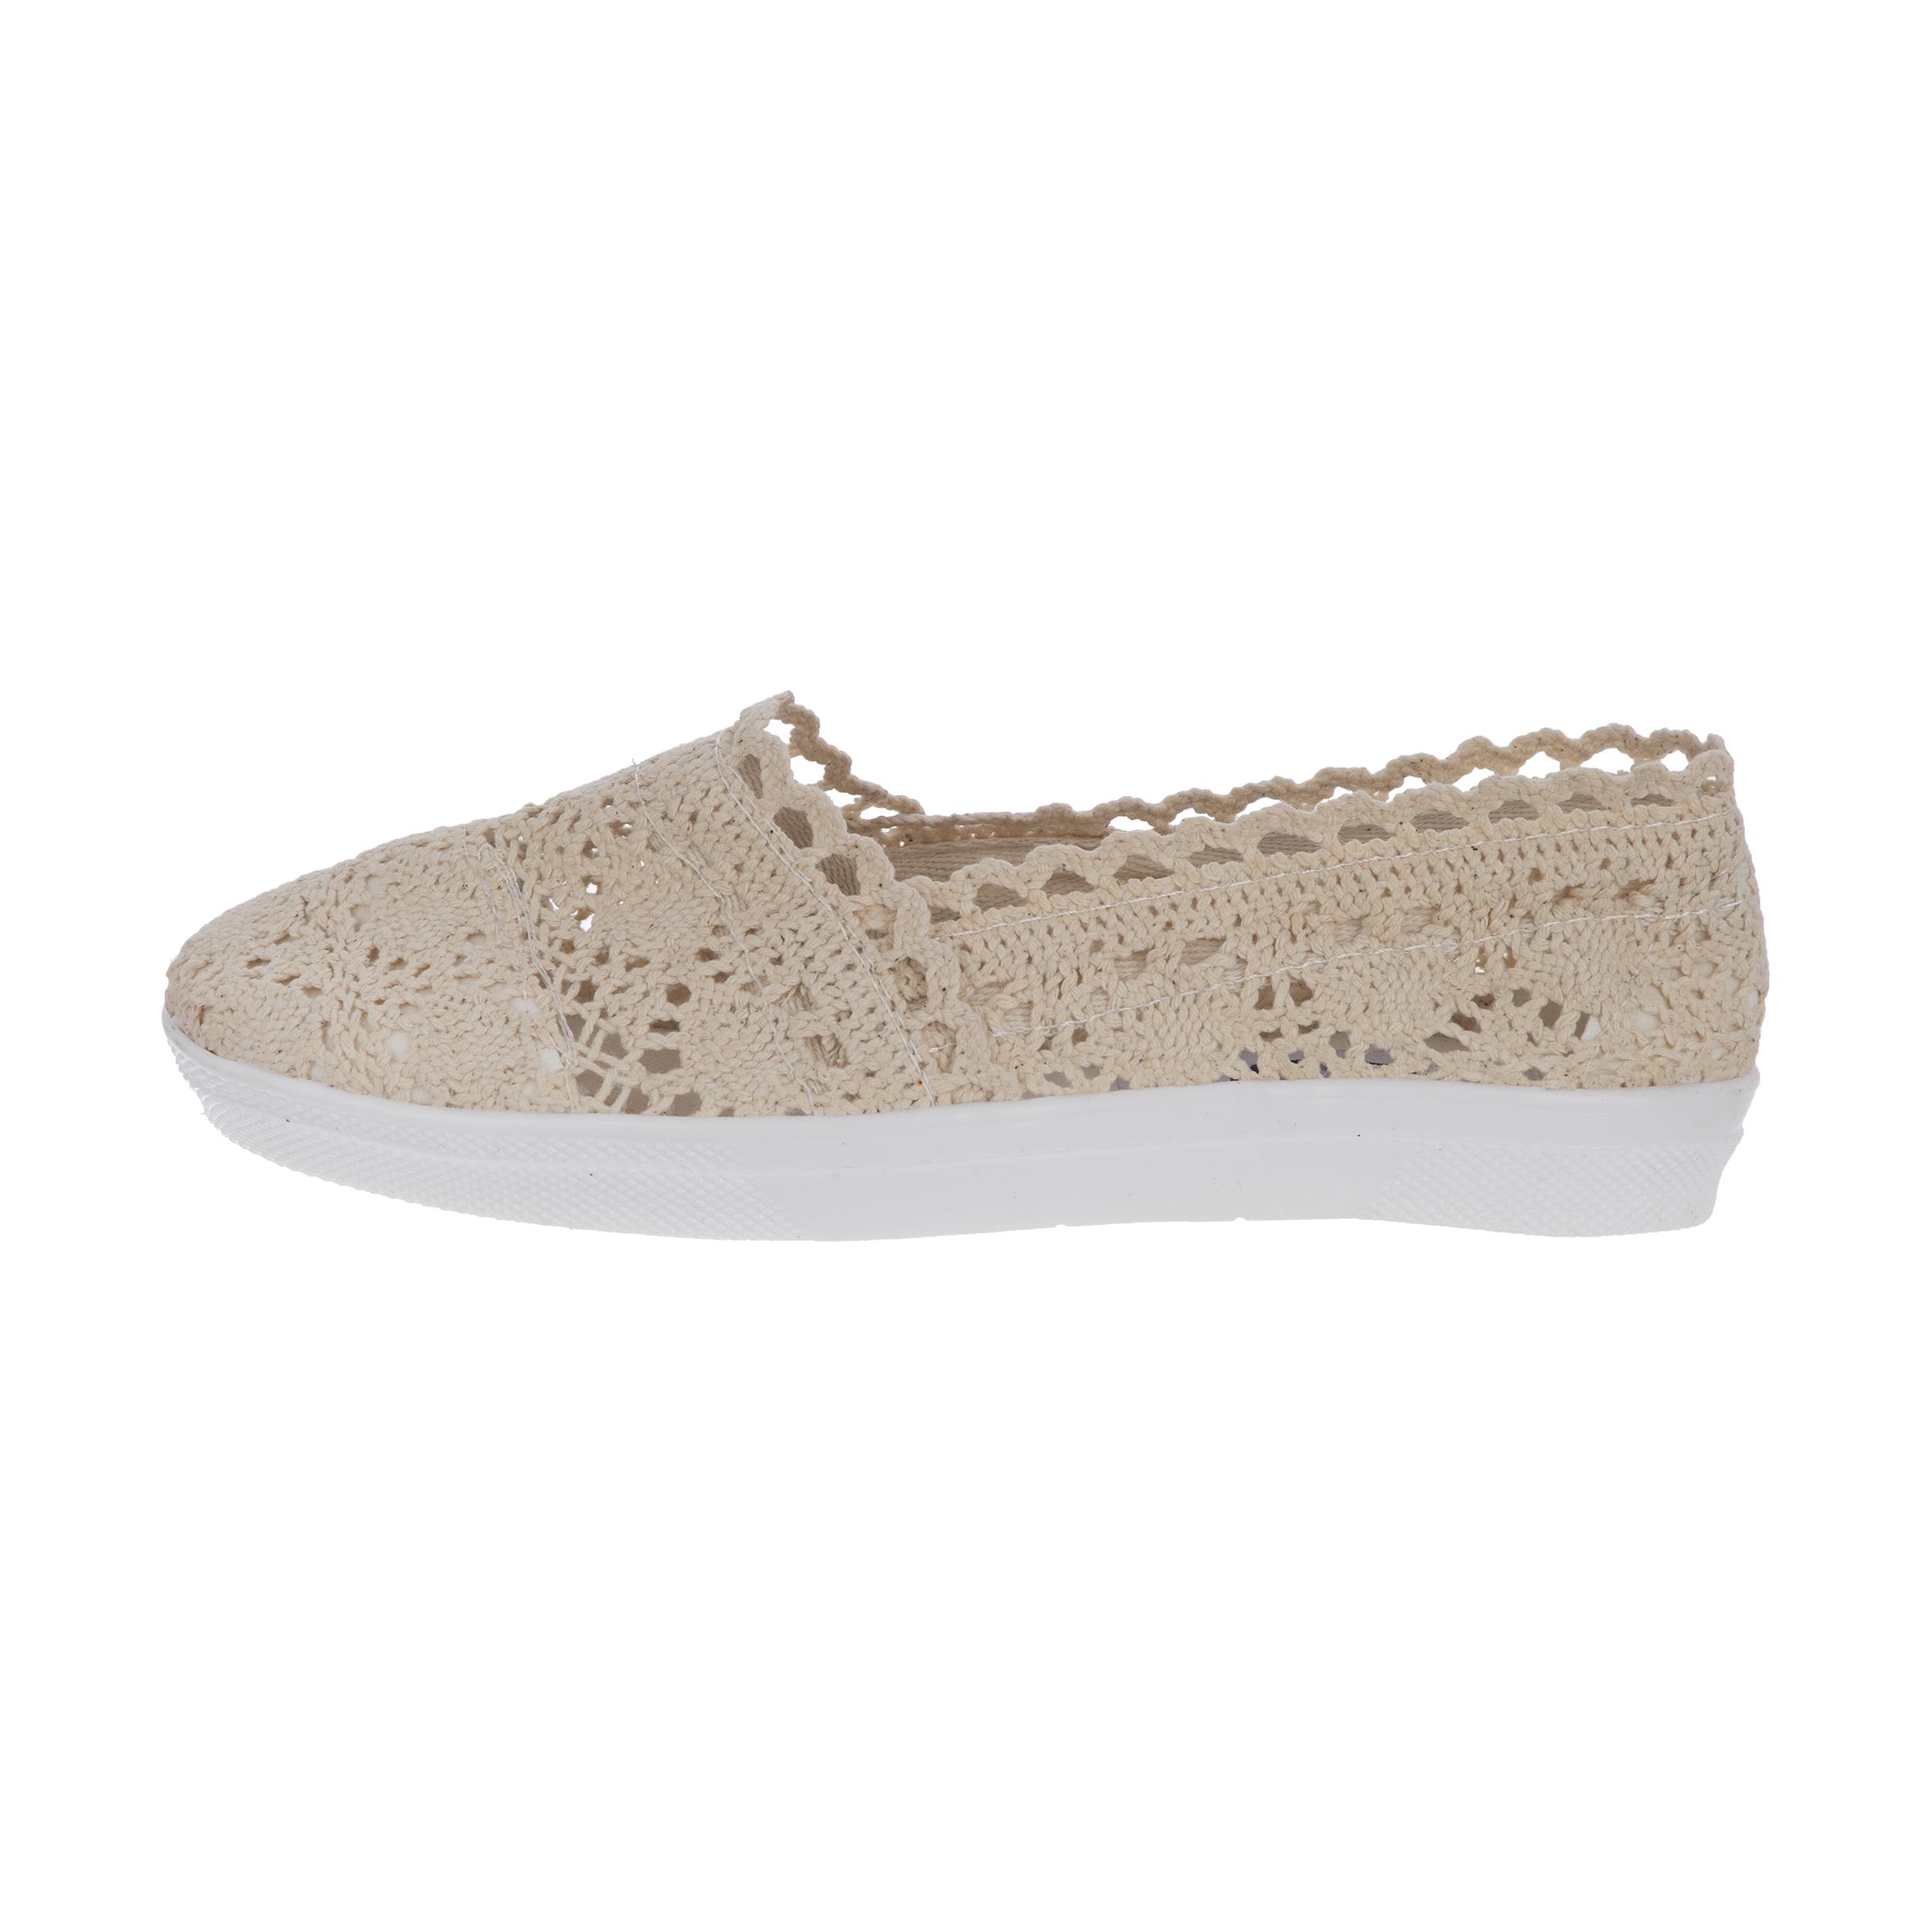 کفش روزمره زنانه ریمکس مدل 1007a100106